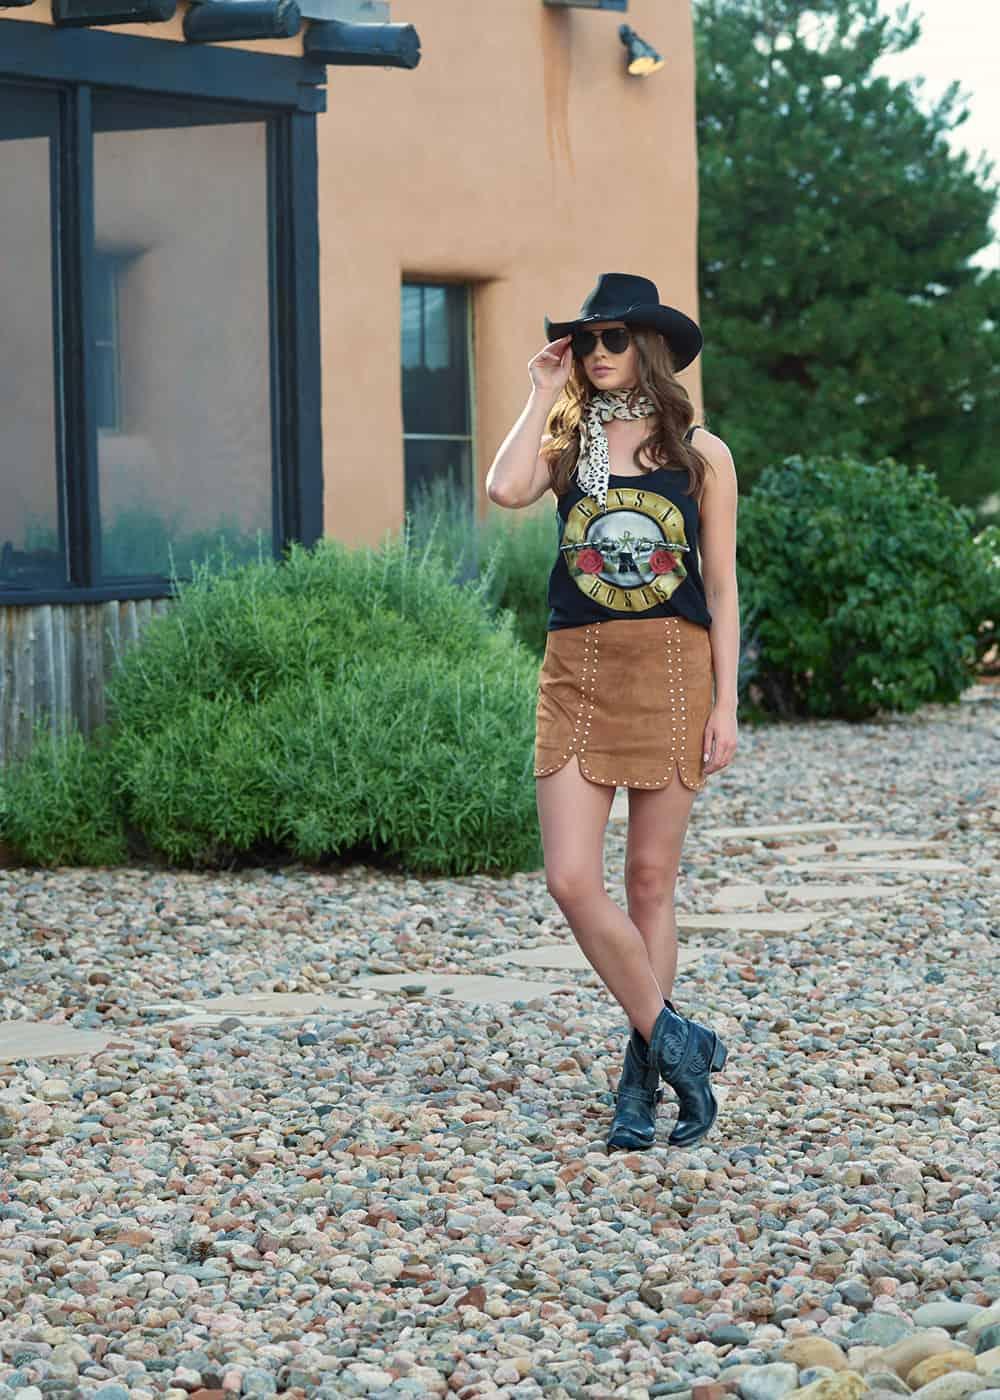 charlie 1 horse desperado cowgirl magazine